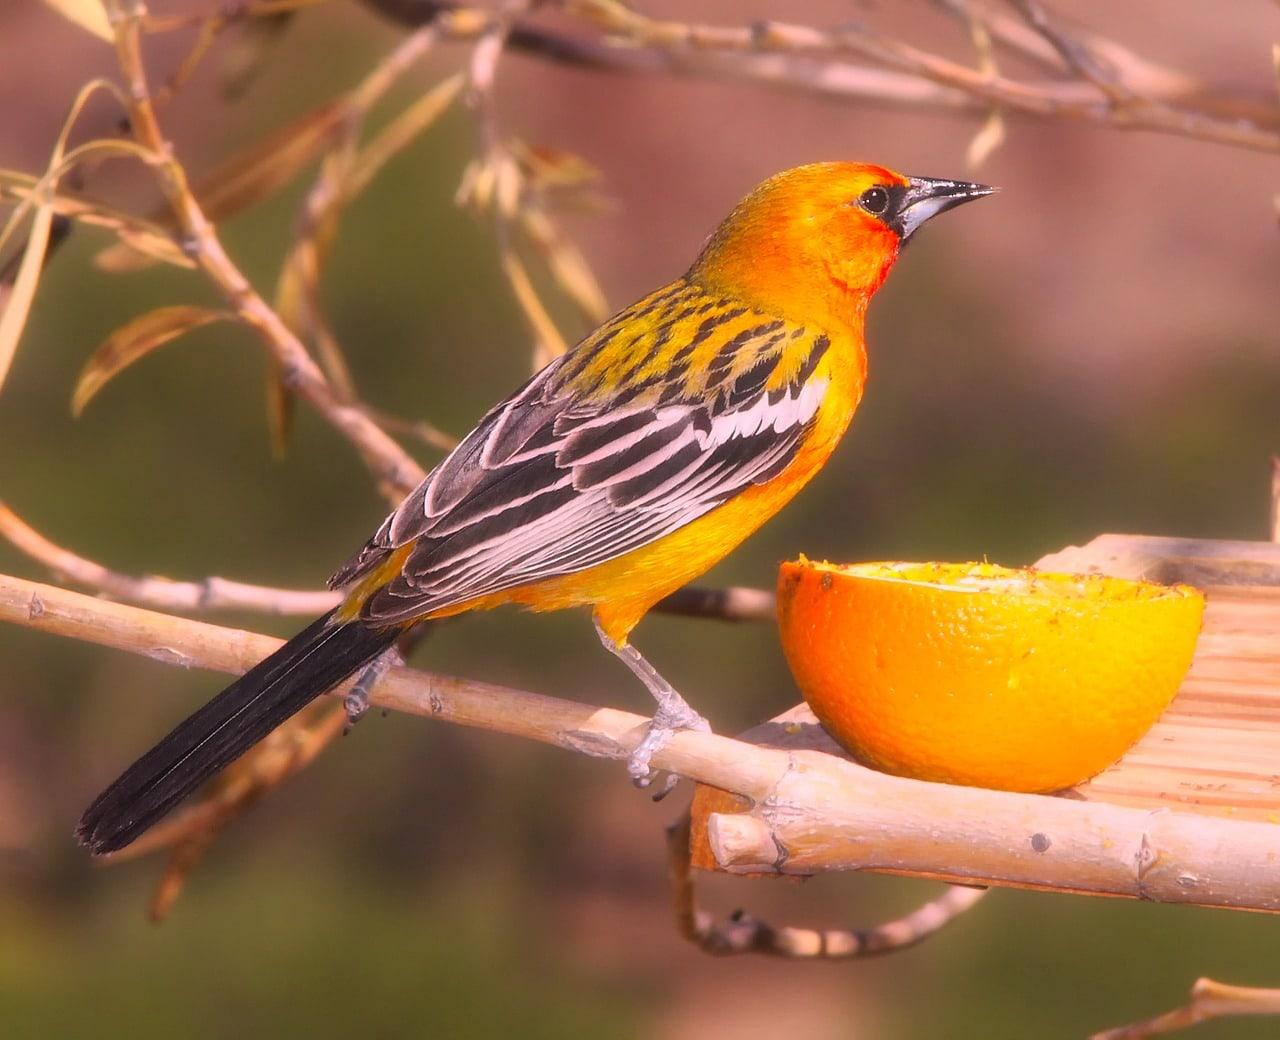 oriole and orange close up